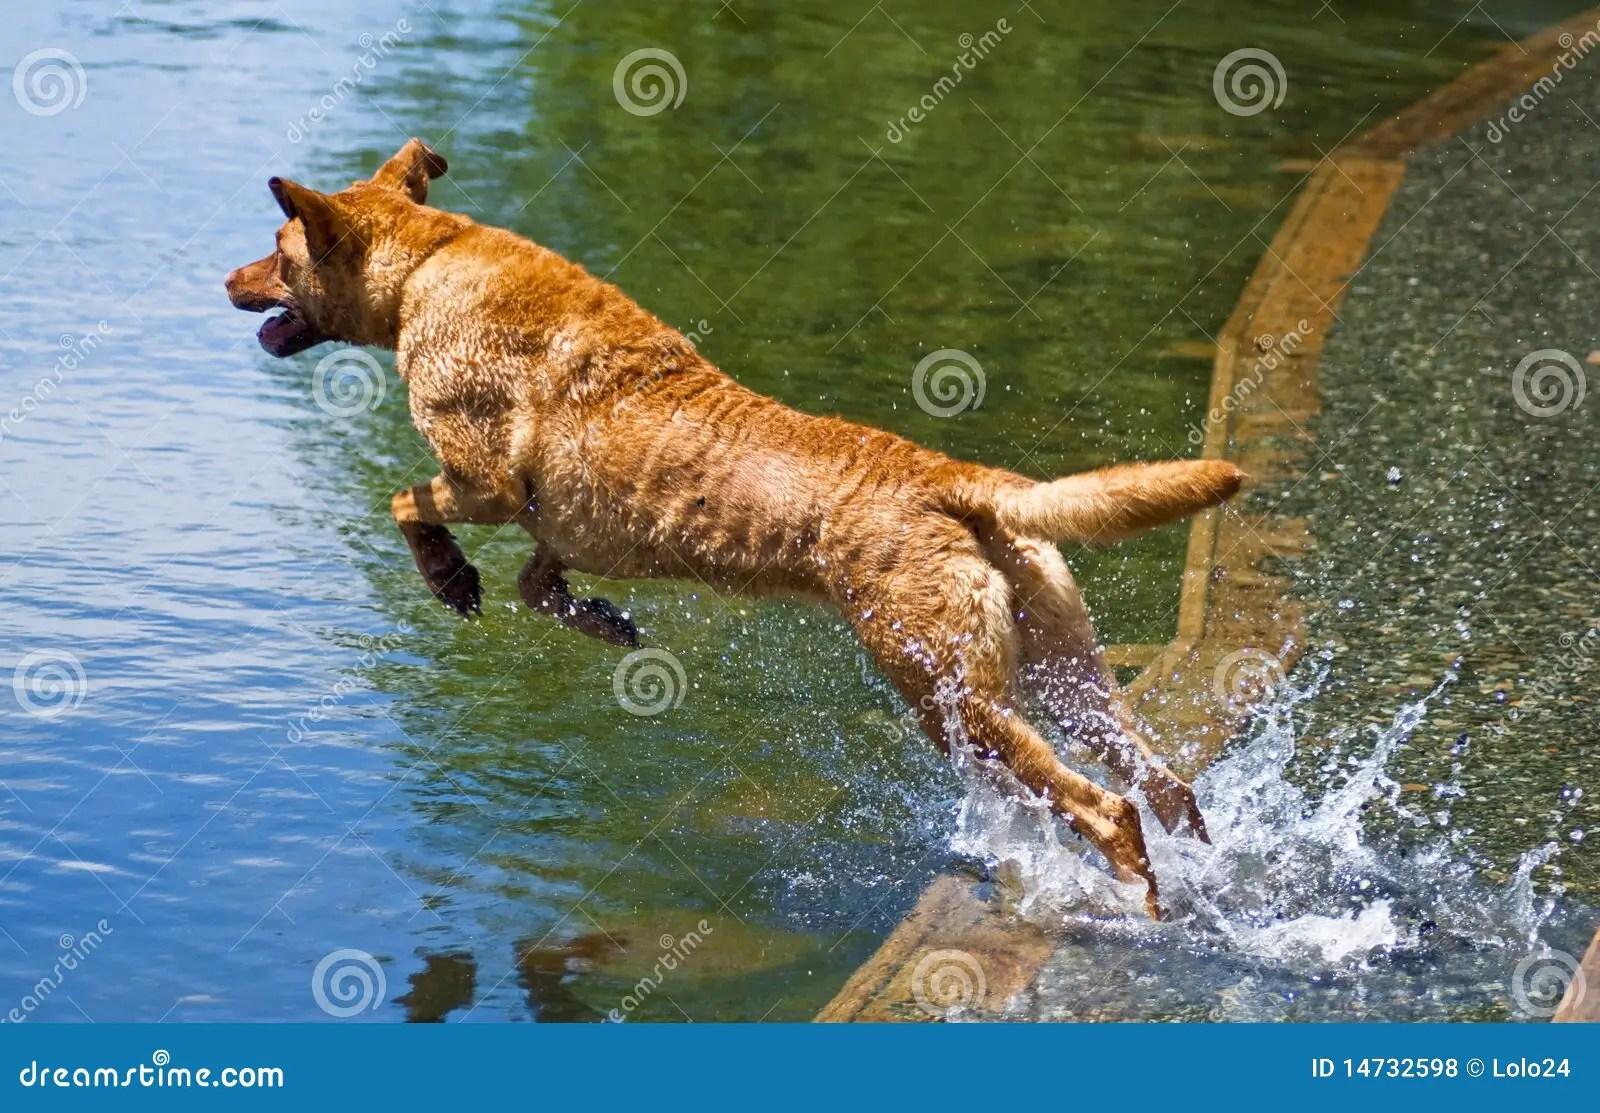 Dog Jumping Into Water Royalty Free Stock Photos Image